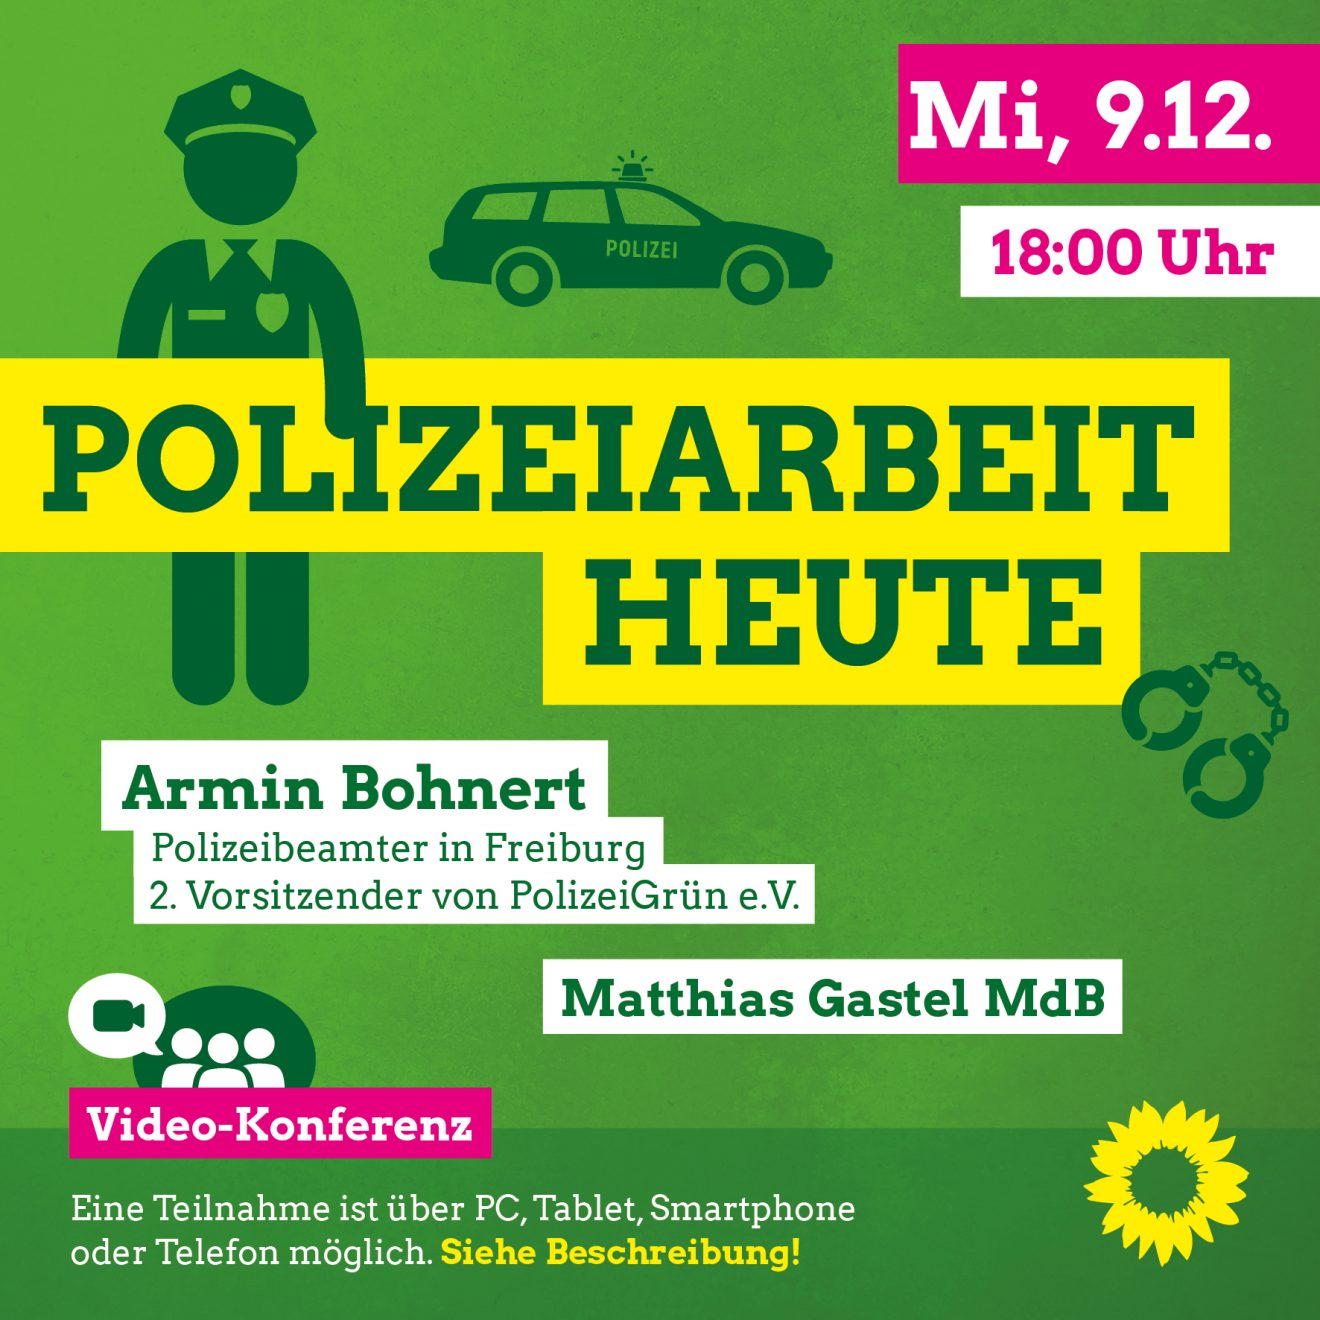 Sharepic_Polizeiarbeit.09.12